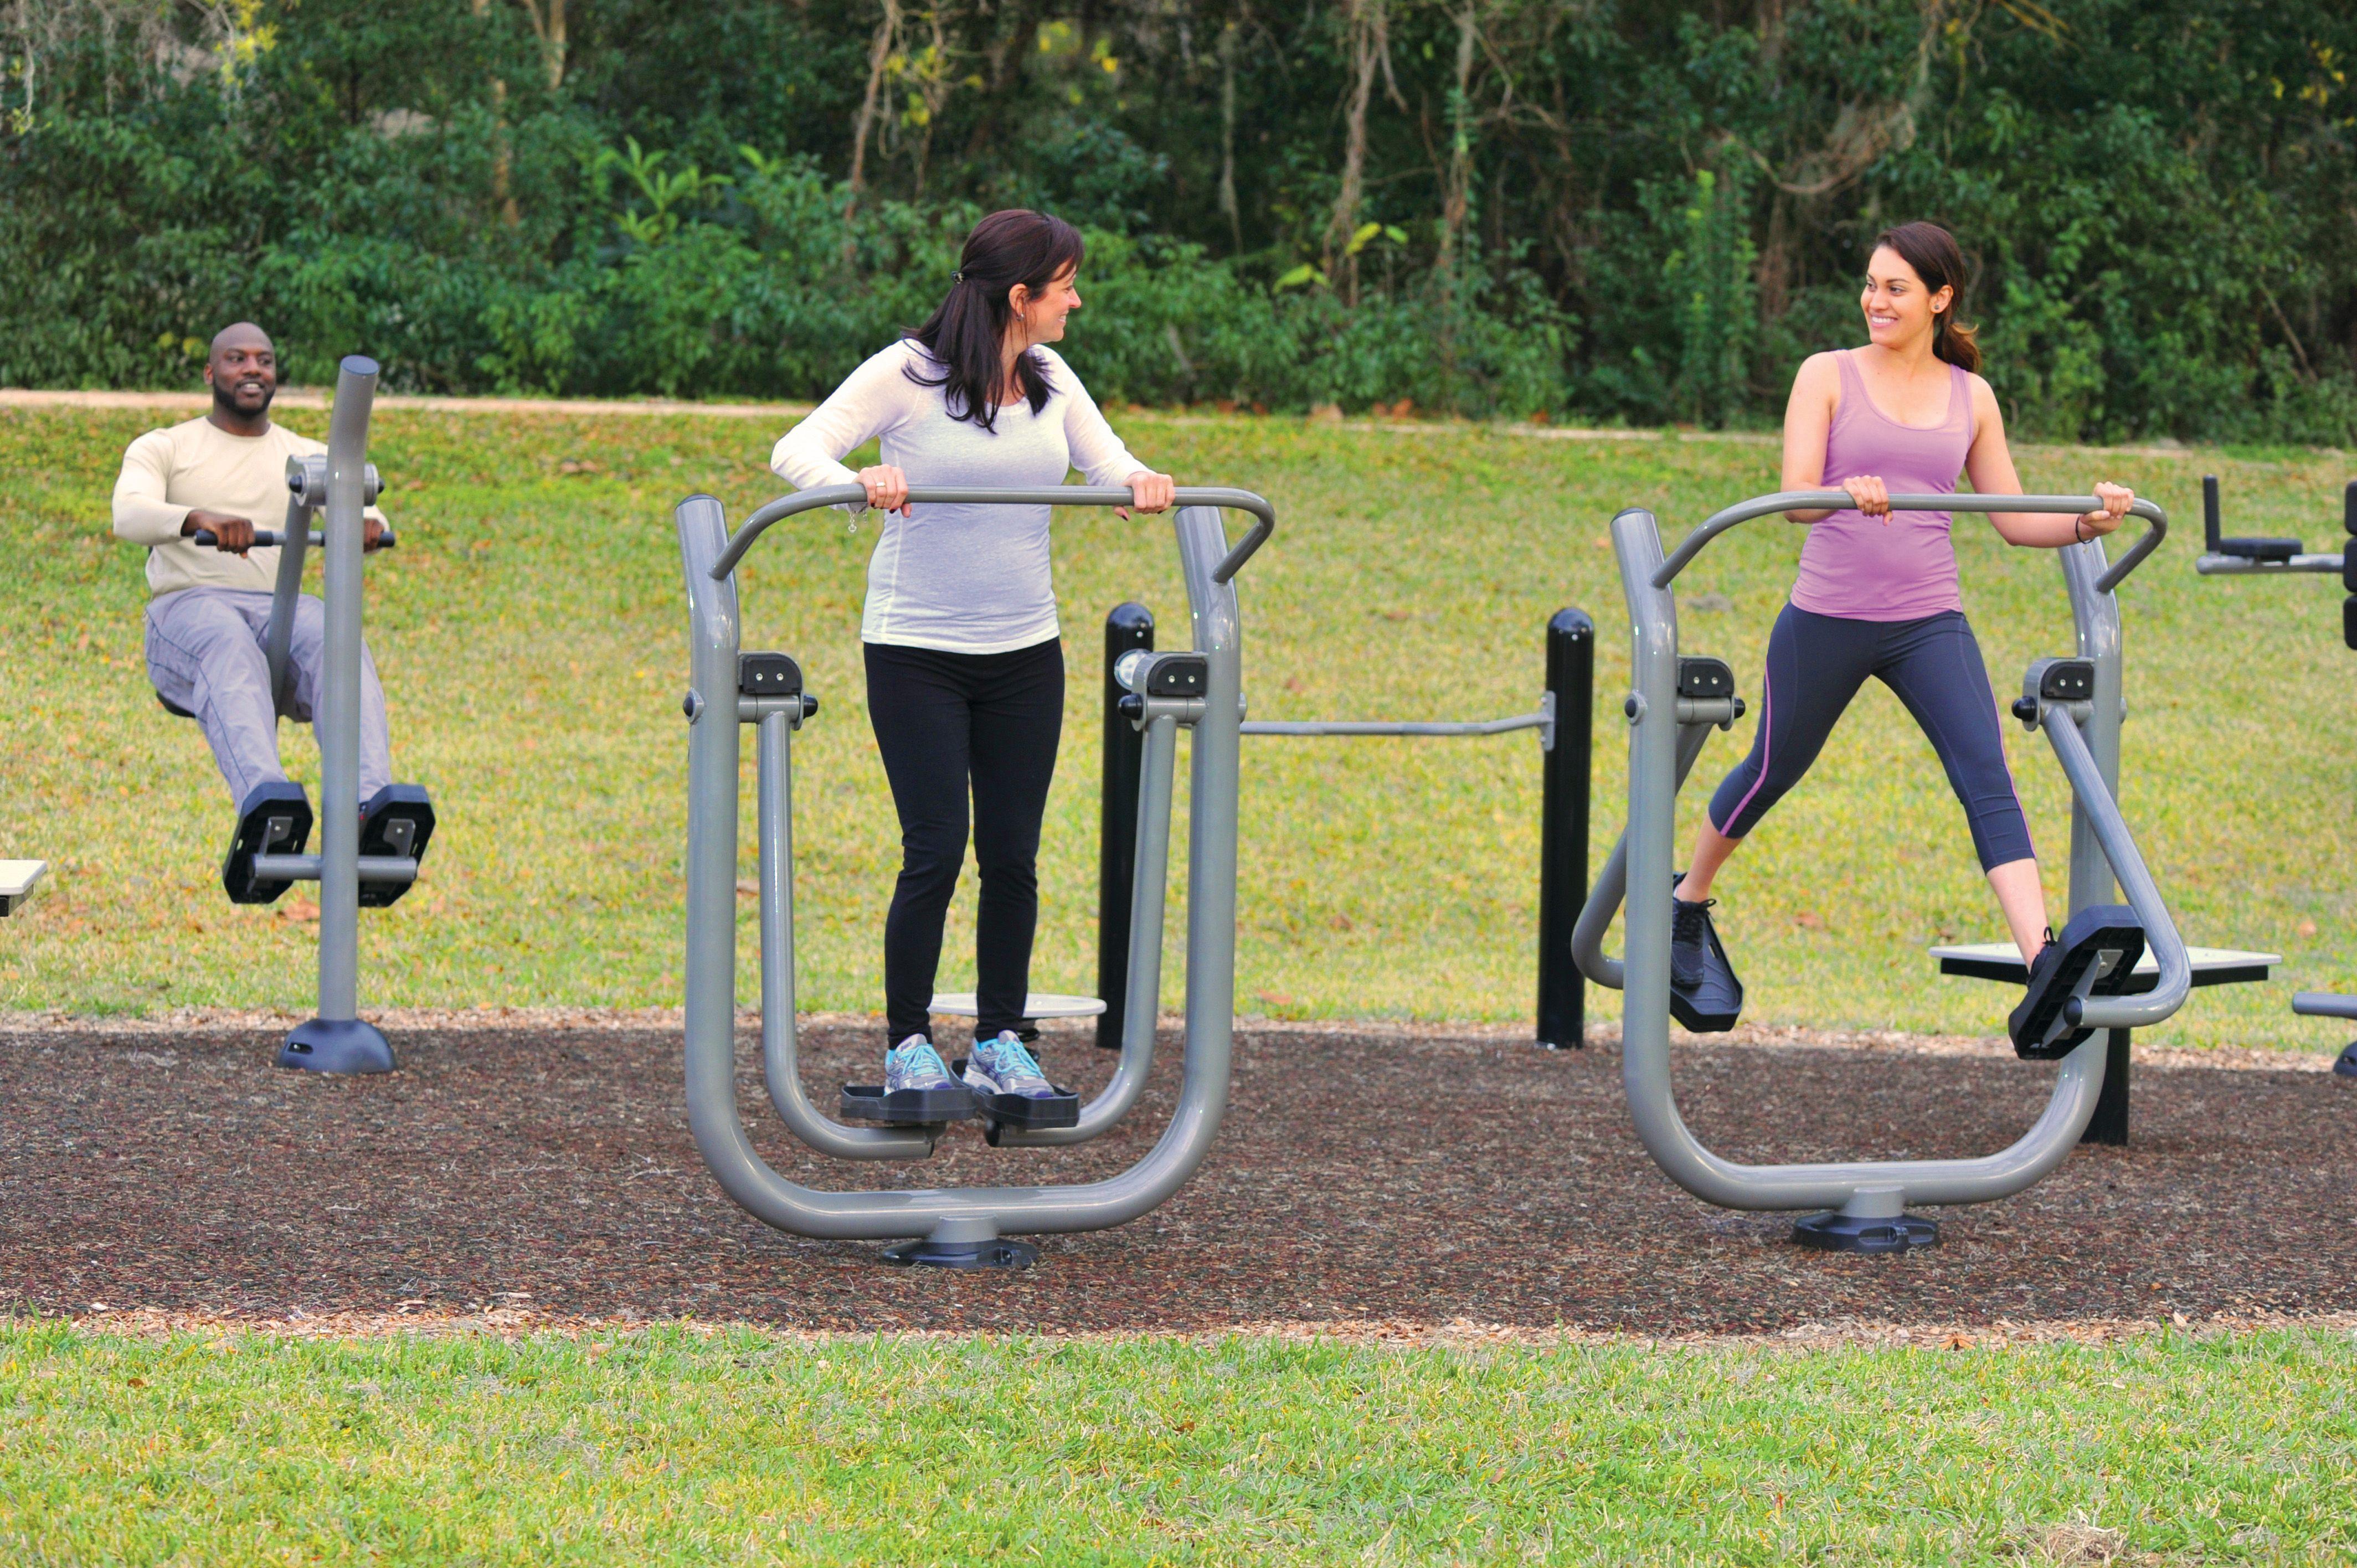 Outdoor fitness equipment  #advancedrecreationalconcepts #fitness #outdoorgym